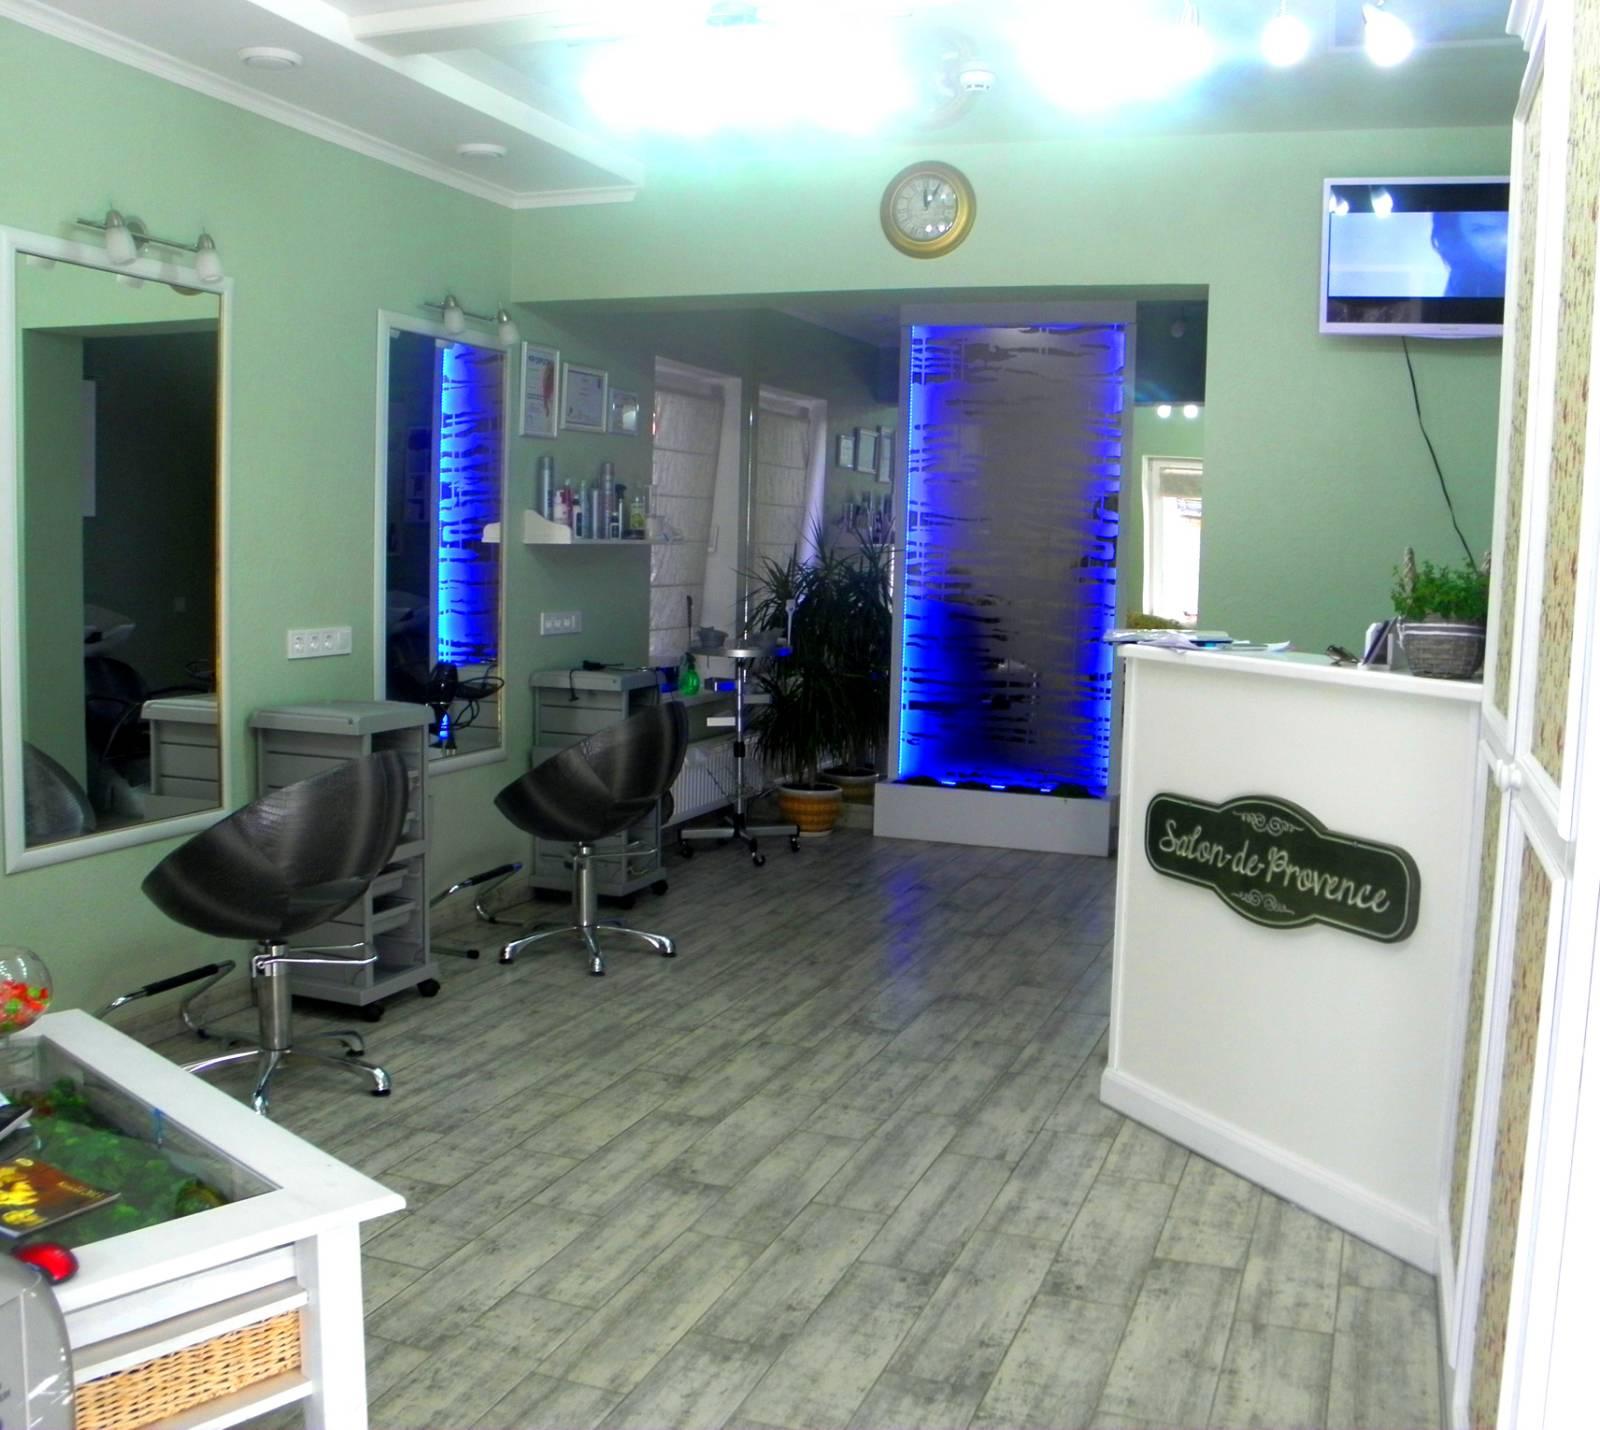 Салон красоты: Salon-de-provence г. Киев